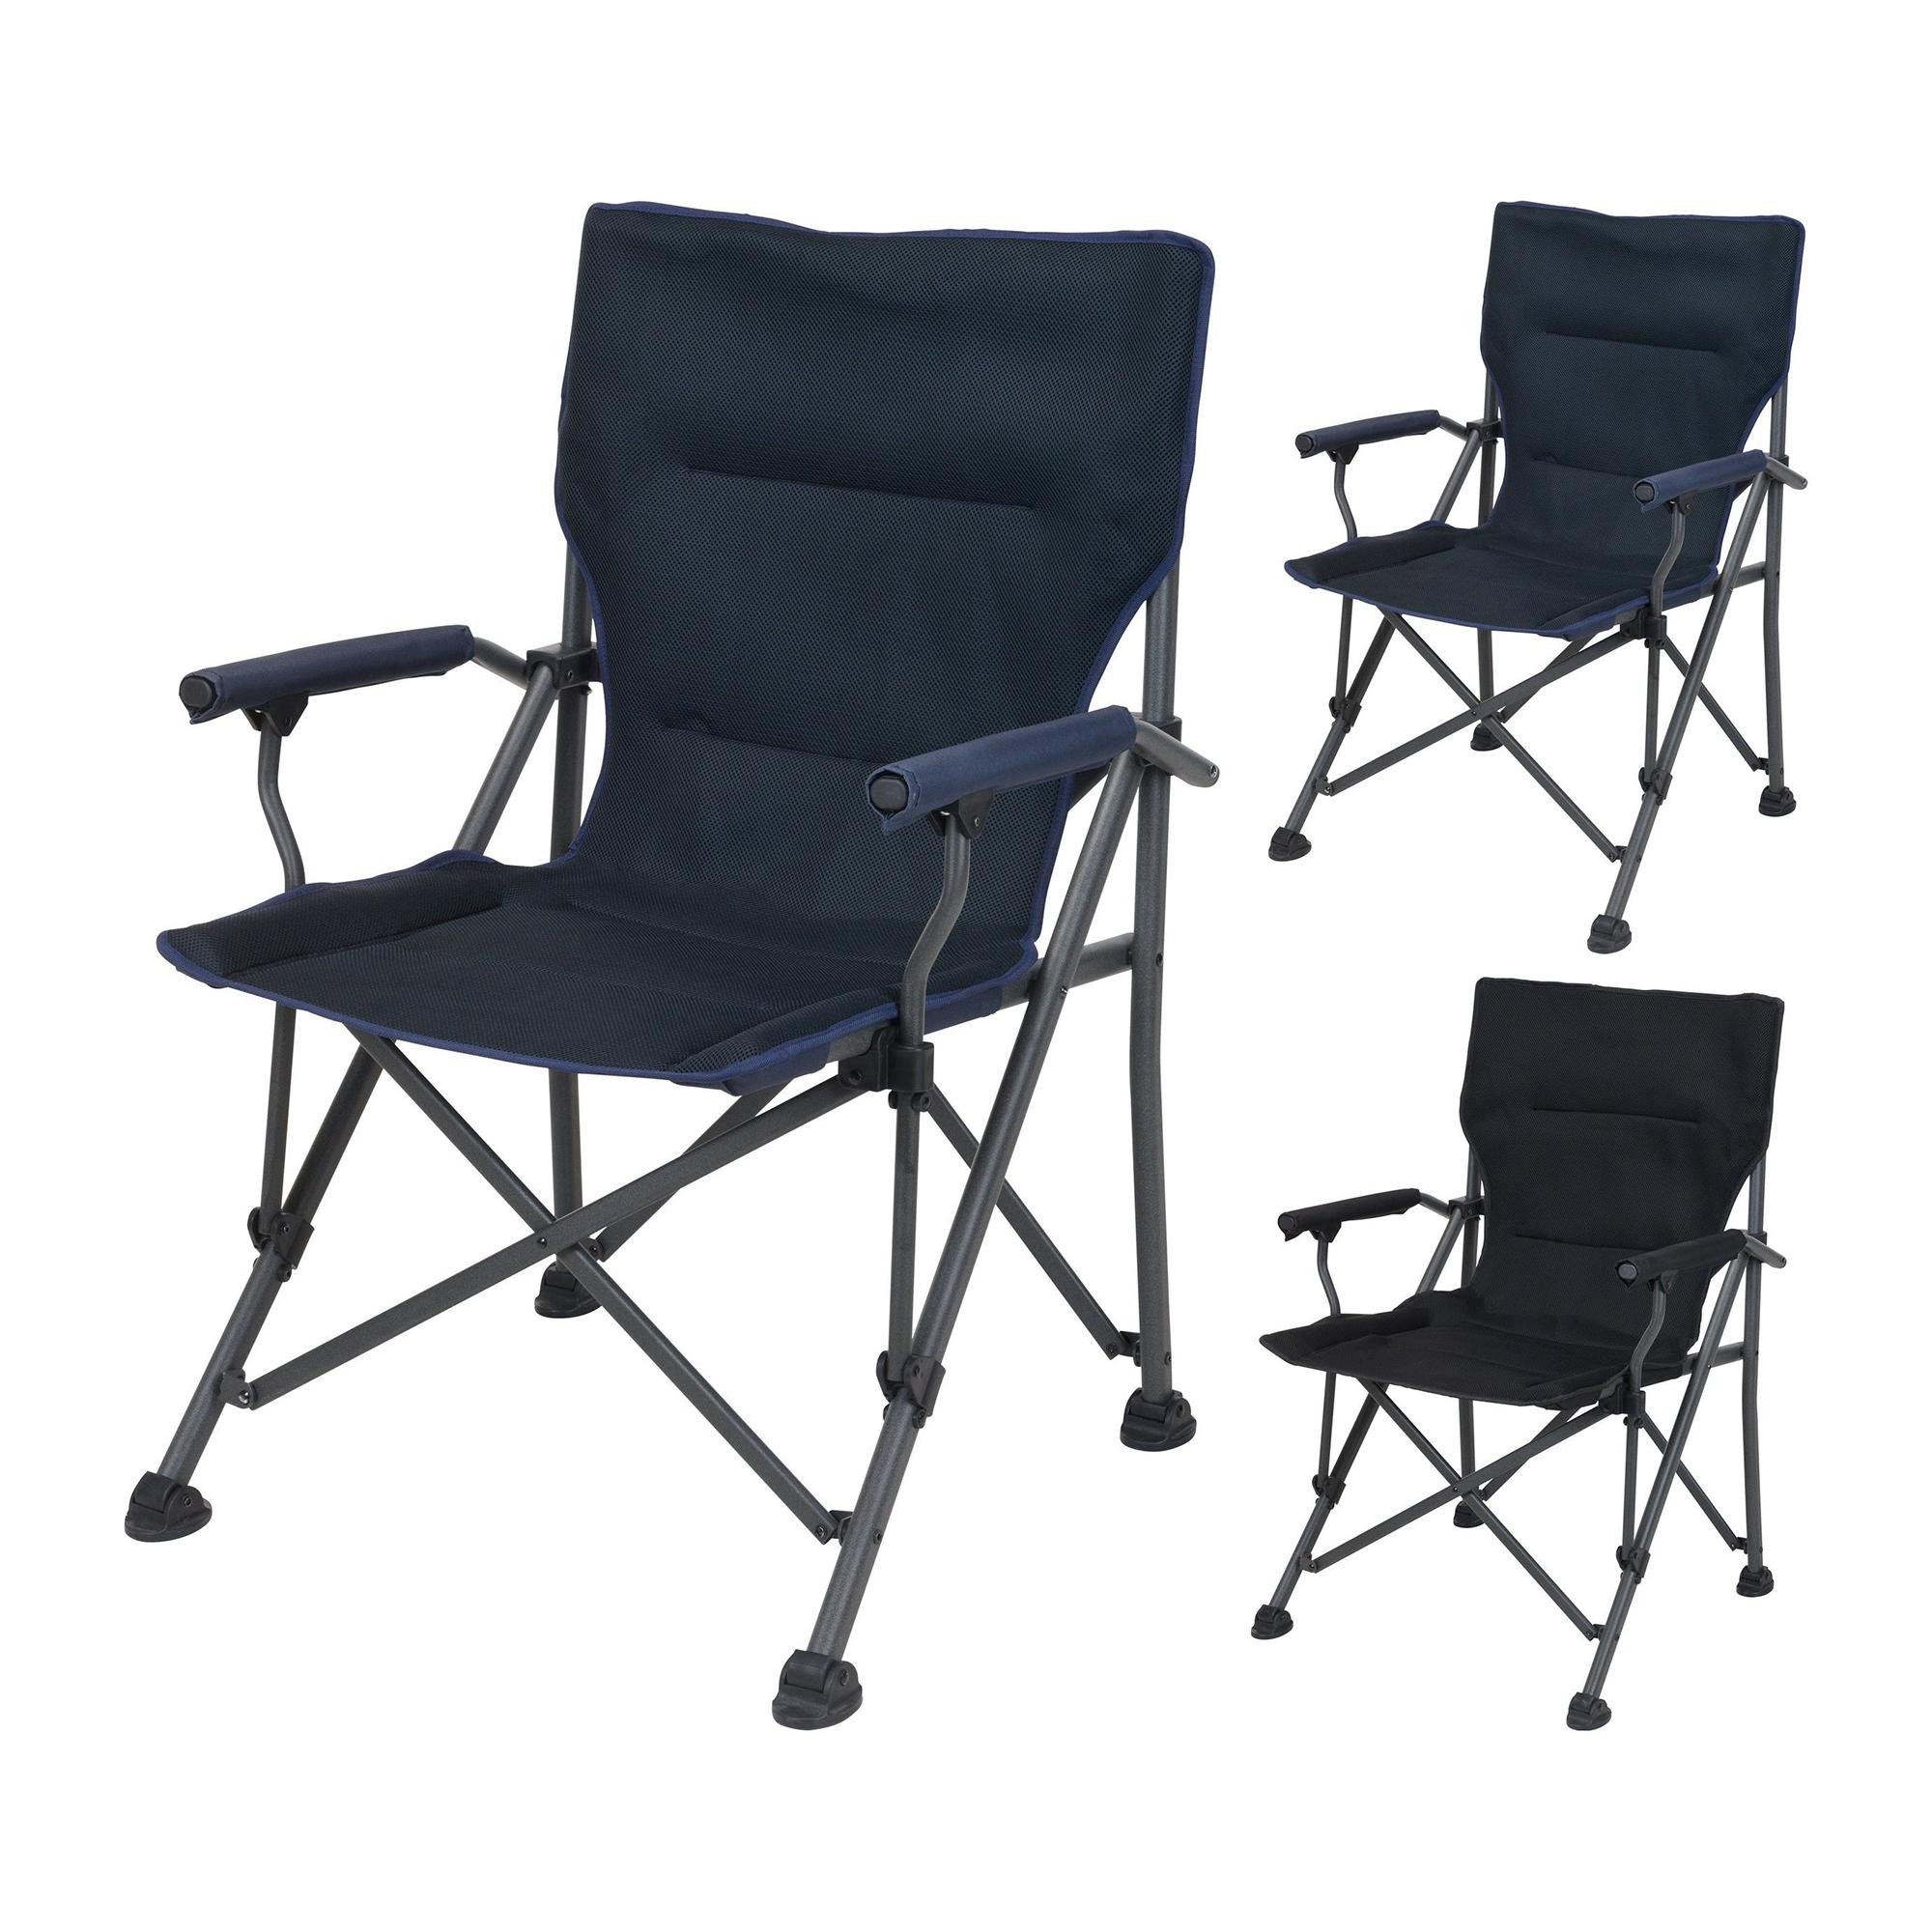 Складное кресло для кемпинга Koopman camping 90x47,5x48,5 см